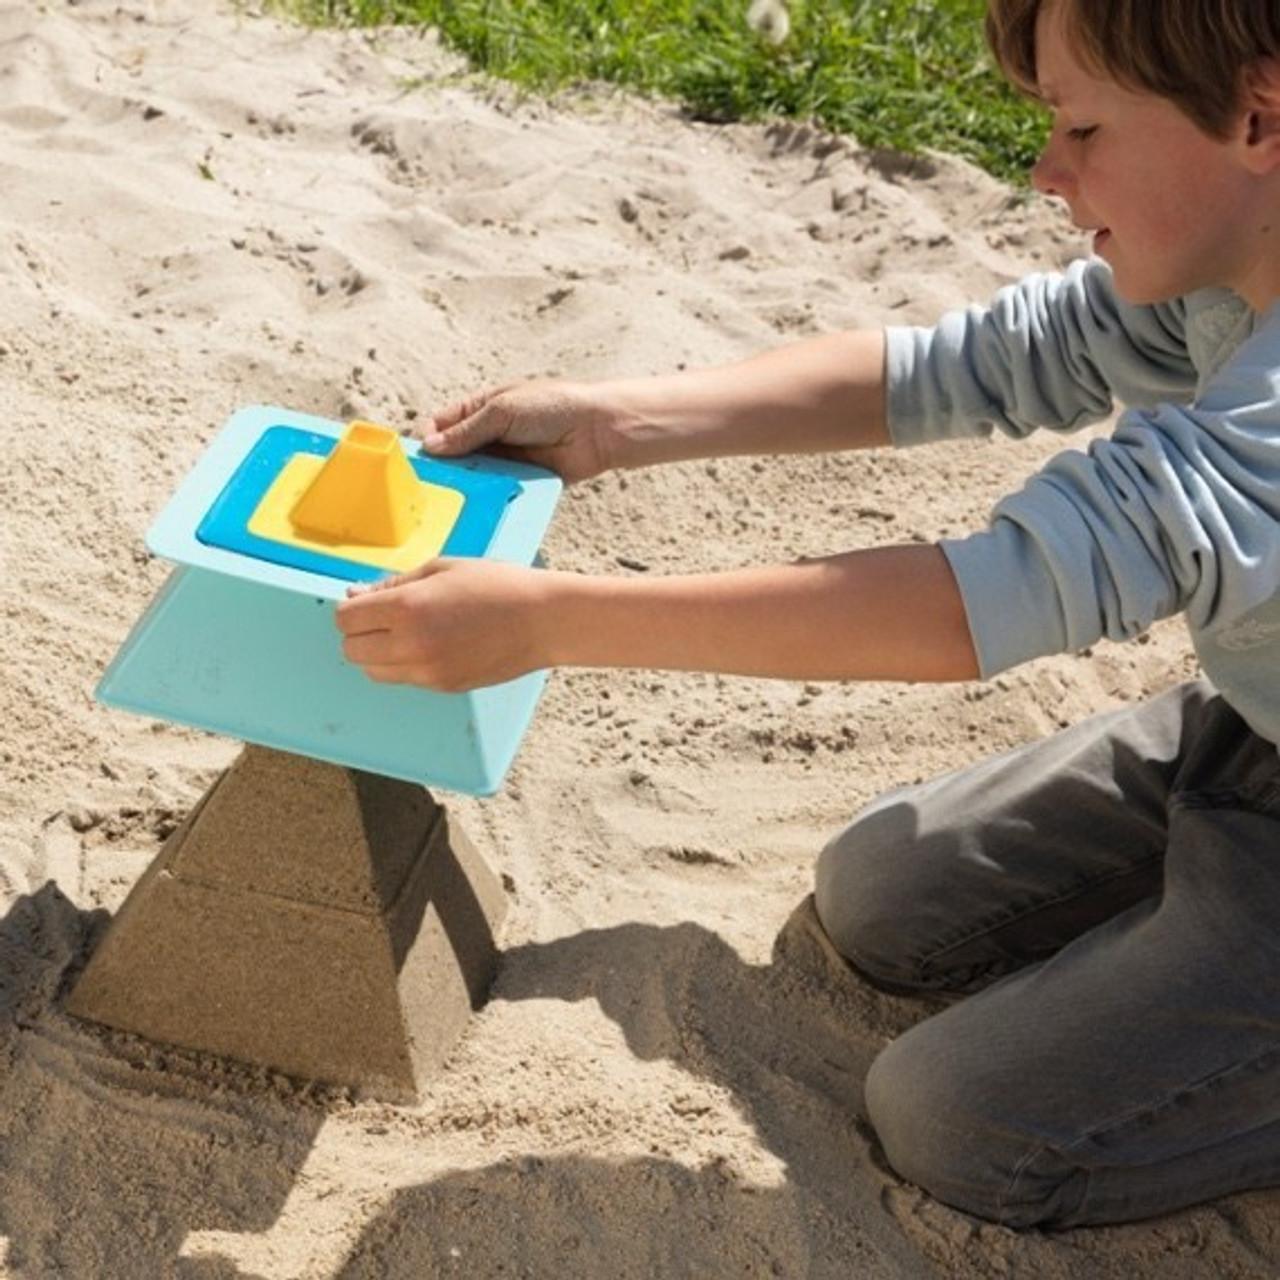 Quut Pira Pyramid Builder for Sand & Snow